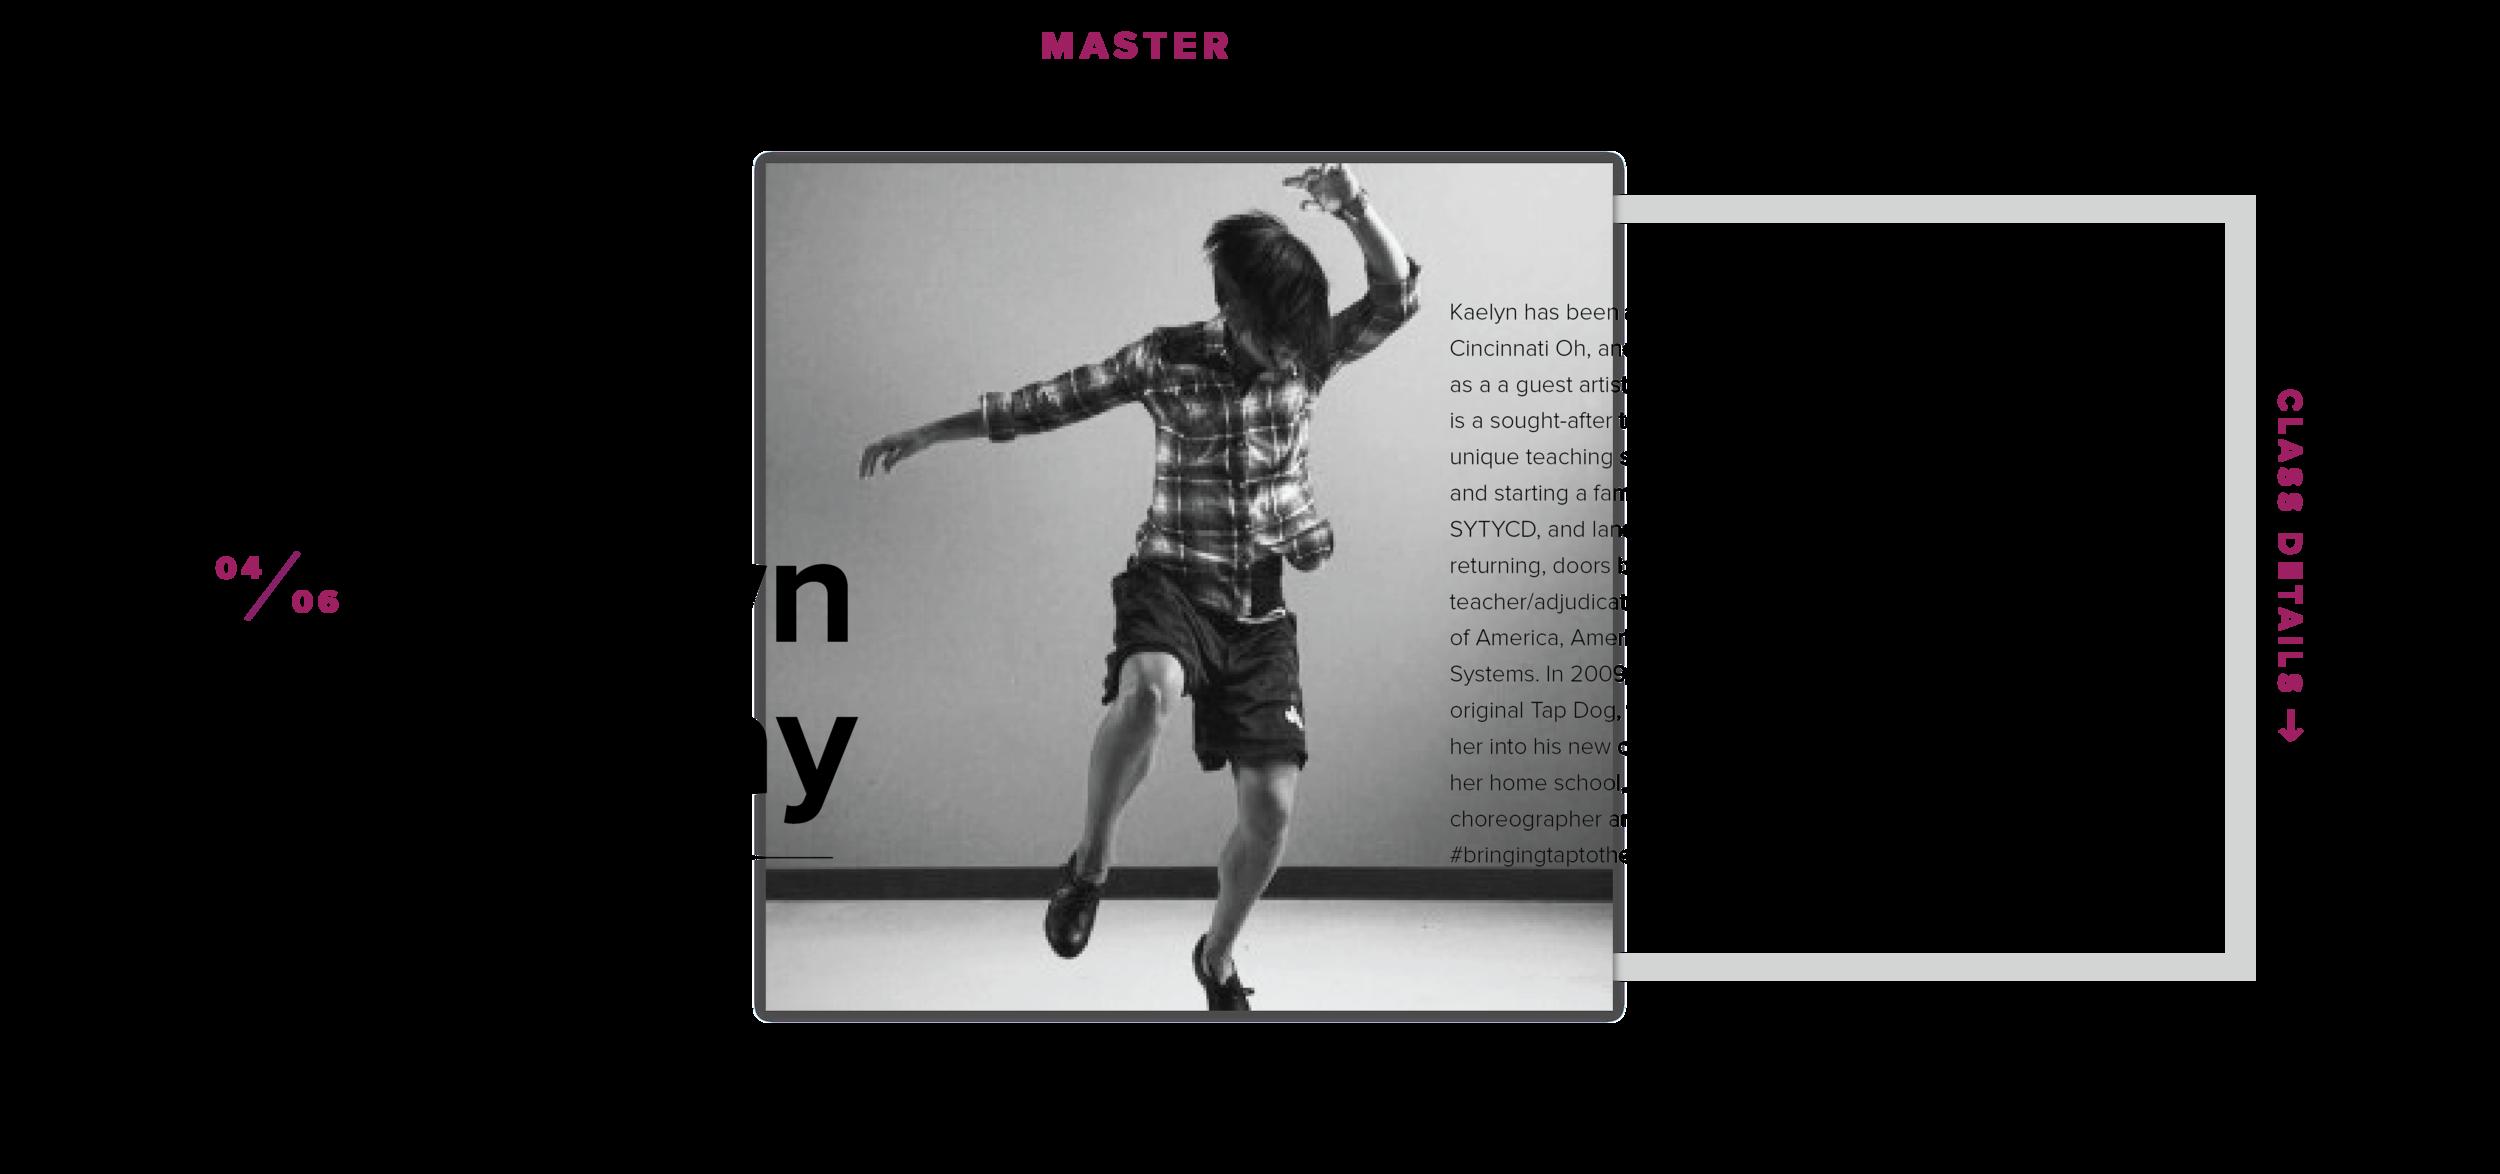 Kaelyn Gray Master Classes at the Dancer's EDGGE